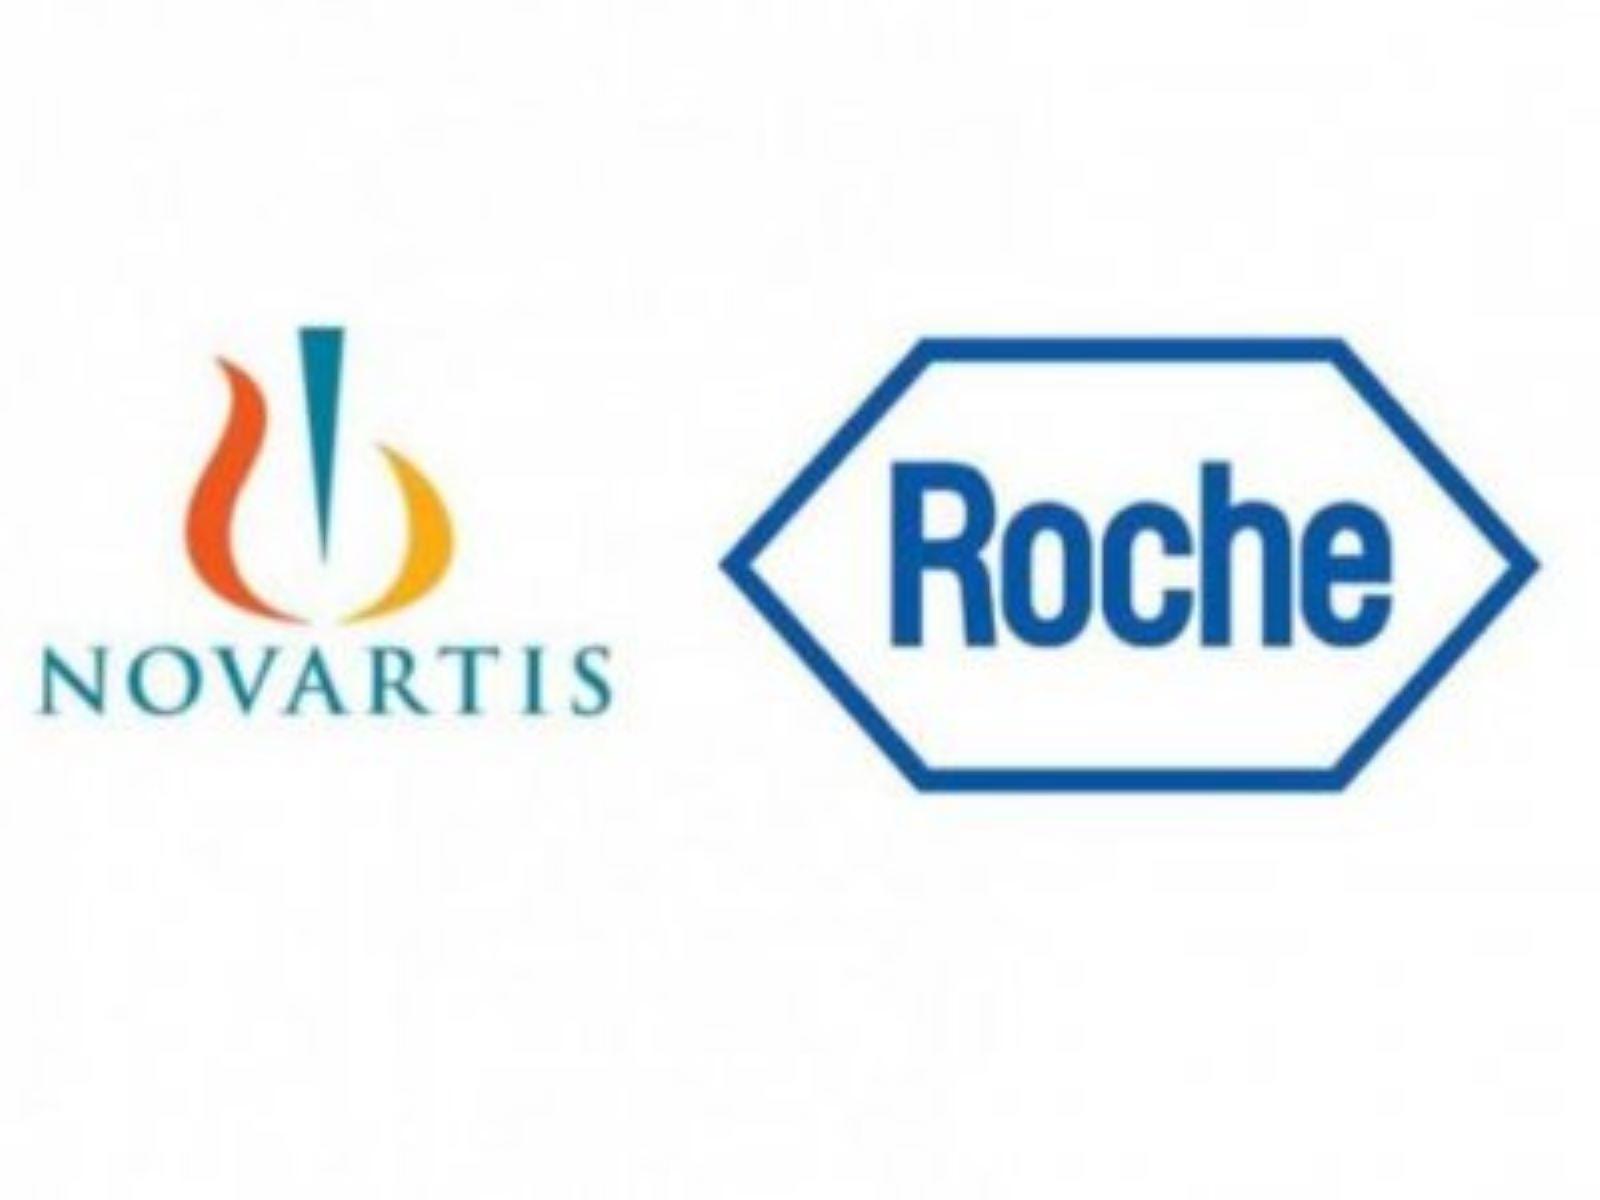 Novartis :Υπογράφει συμφωνία με την Roche για  θεραπεία ρευματοειδούς αρθρίτιδας